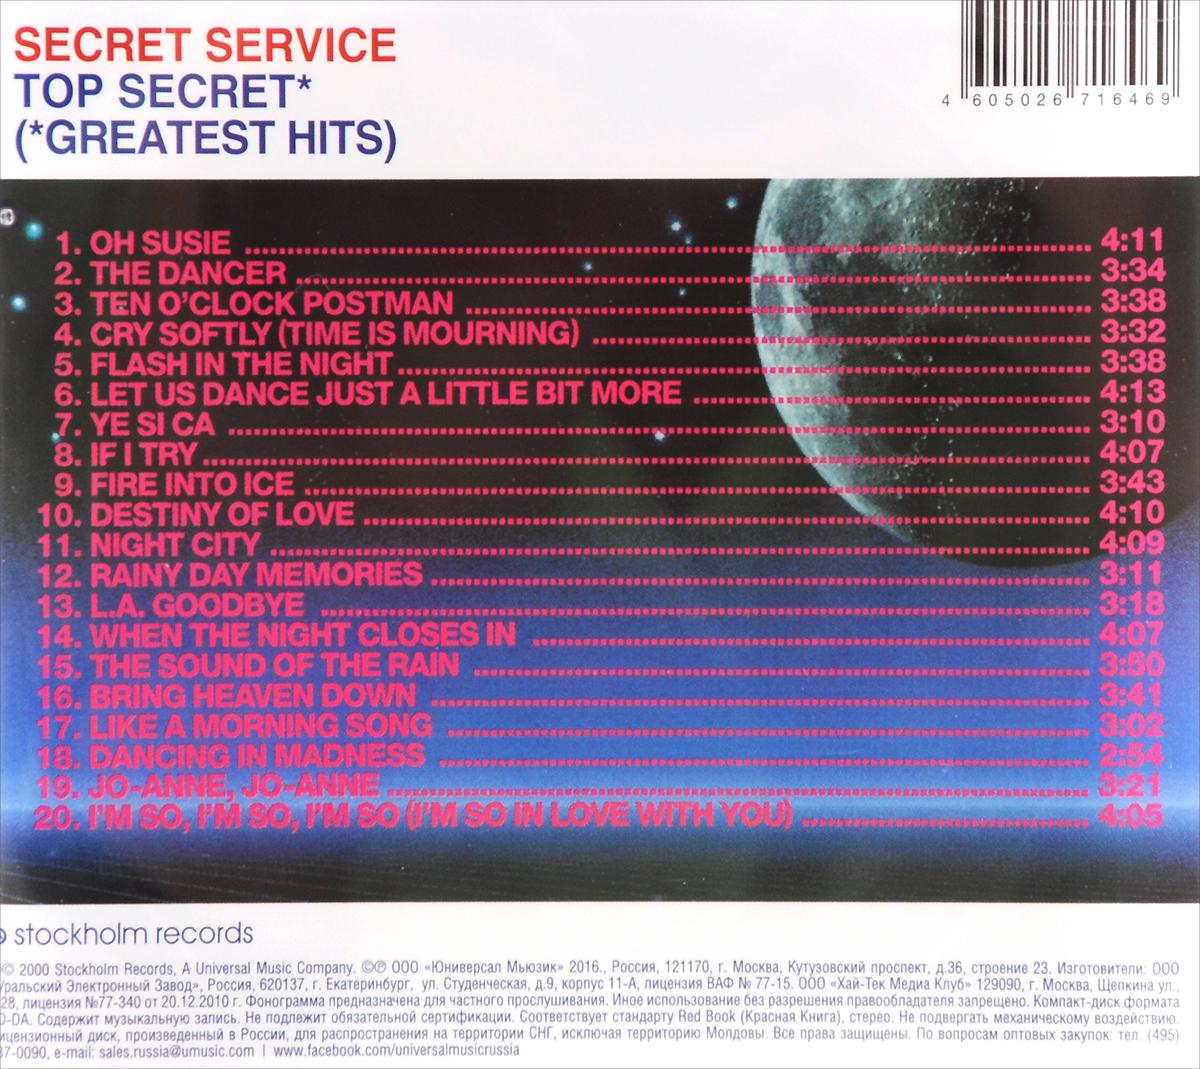 Secret Service.  Top Secret.  Greatest Hits (CD) Stockholm Records,ООО